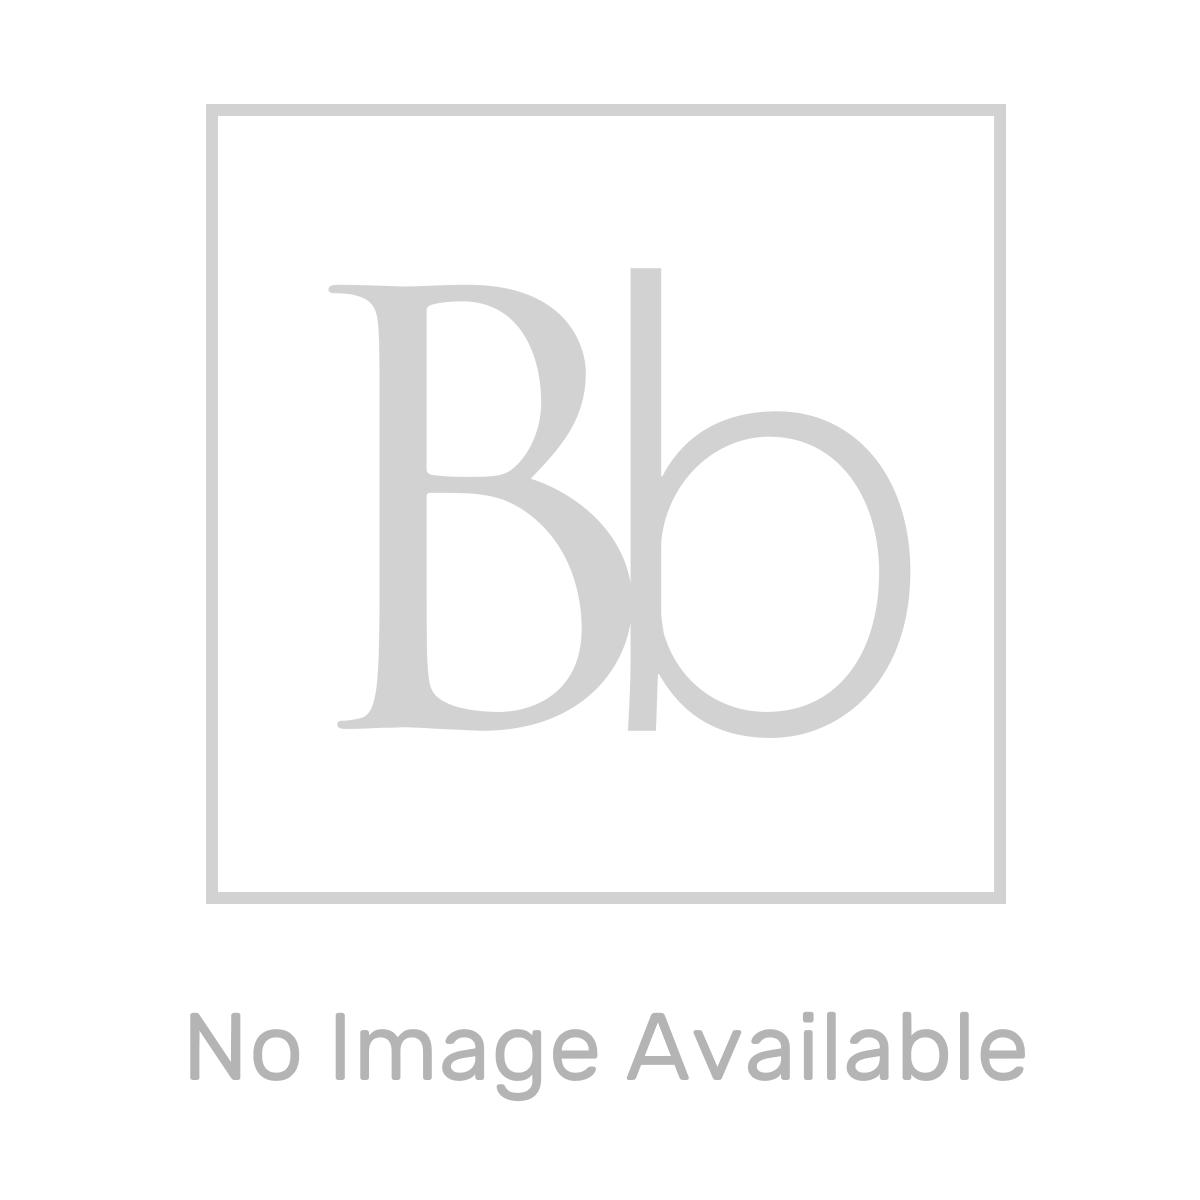 Frontline Aquaglass+ Elite Sliding Shower Door with Optional Side Panel